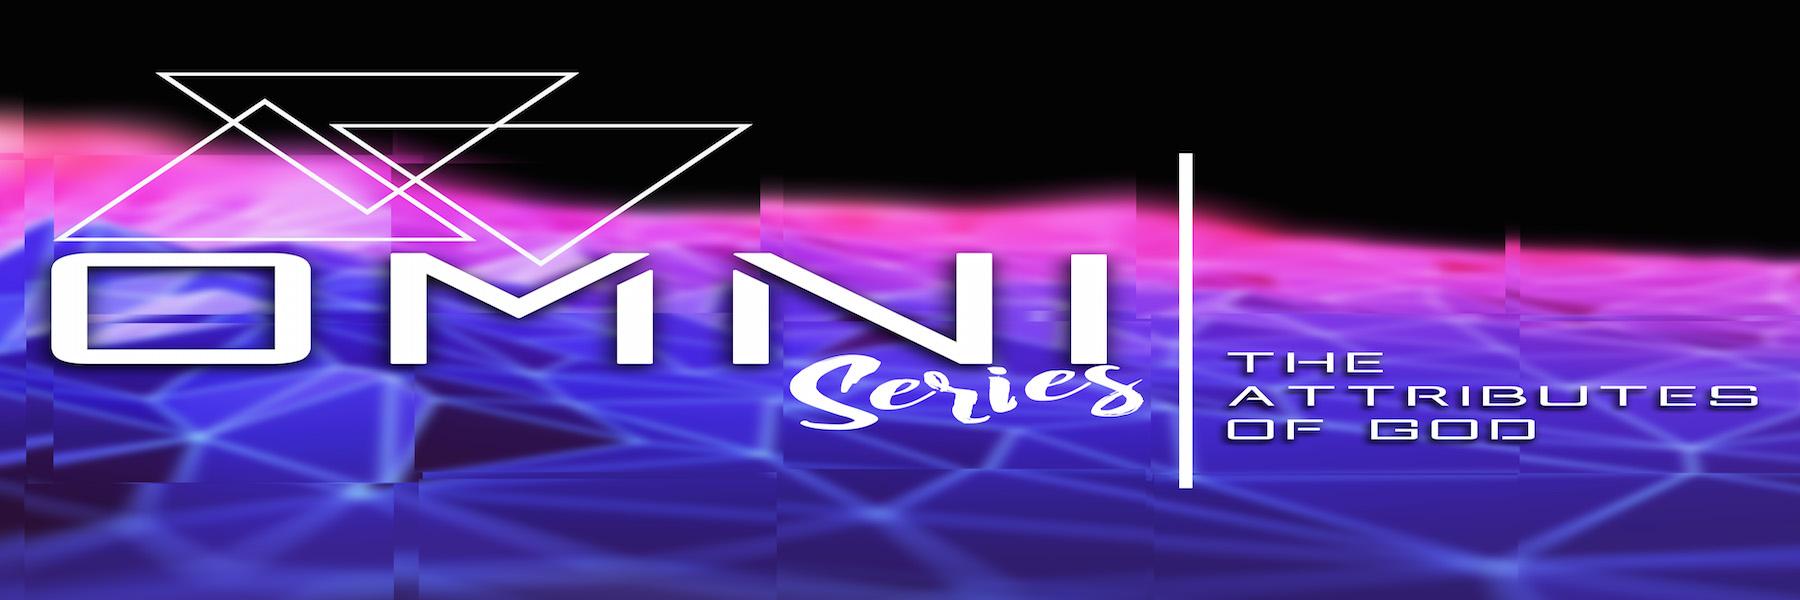 OMNI design.jpg